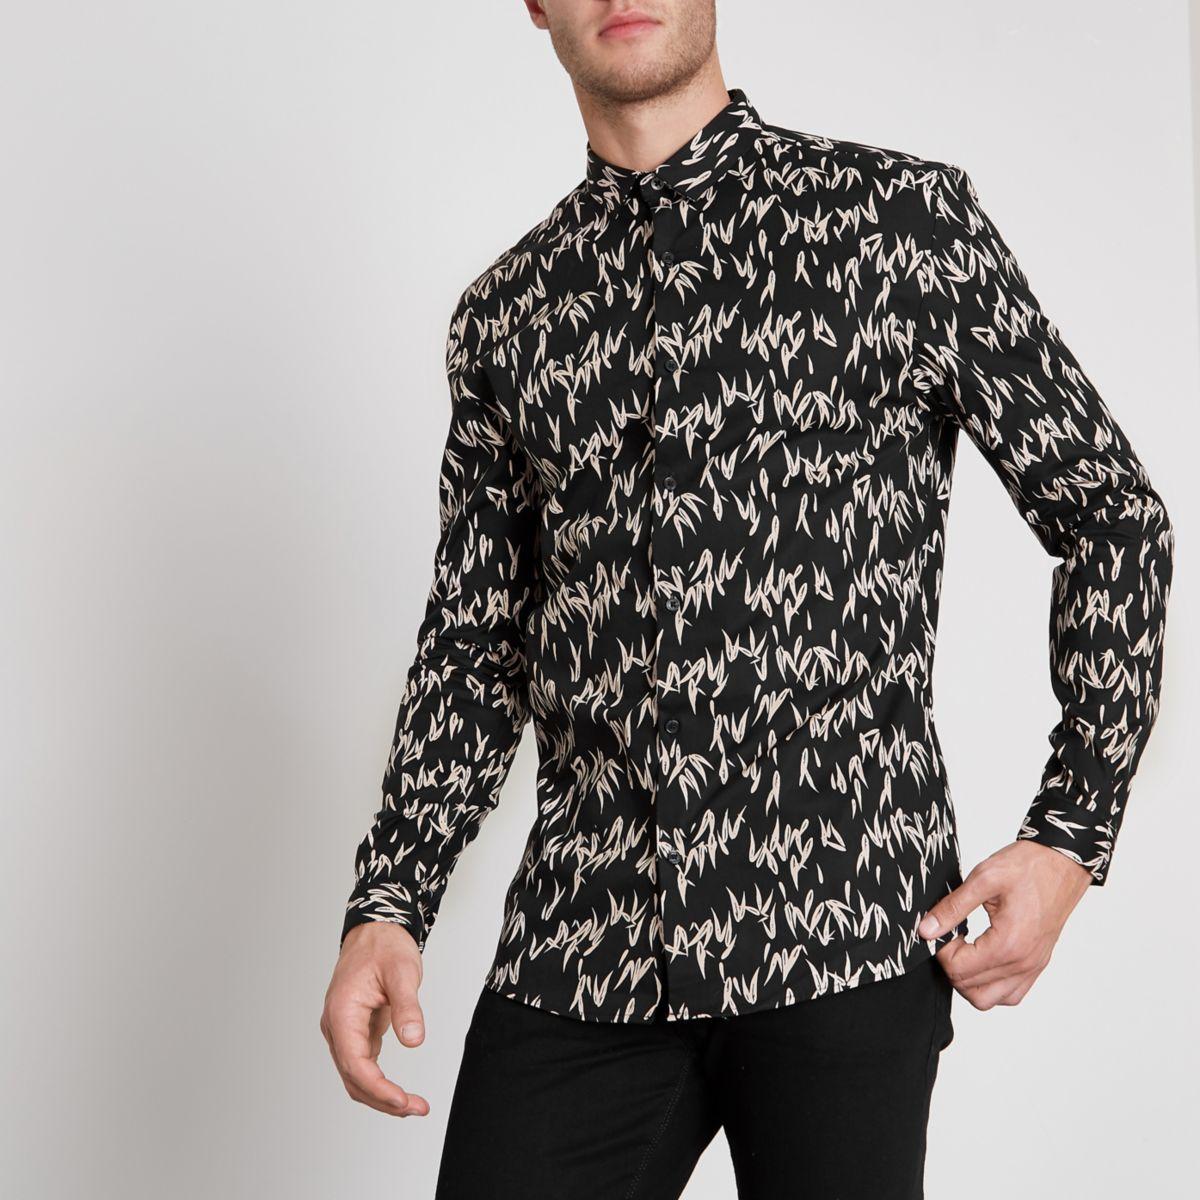 Black droplet print muscle fit shirt